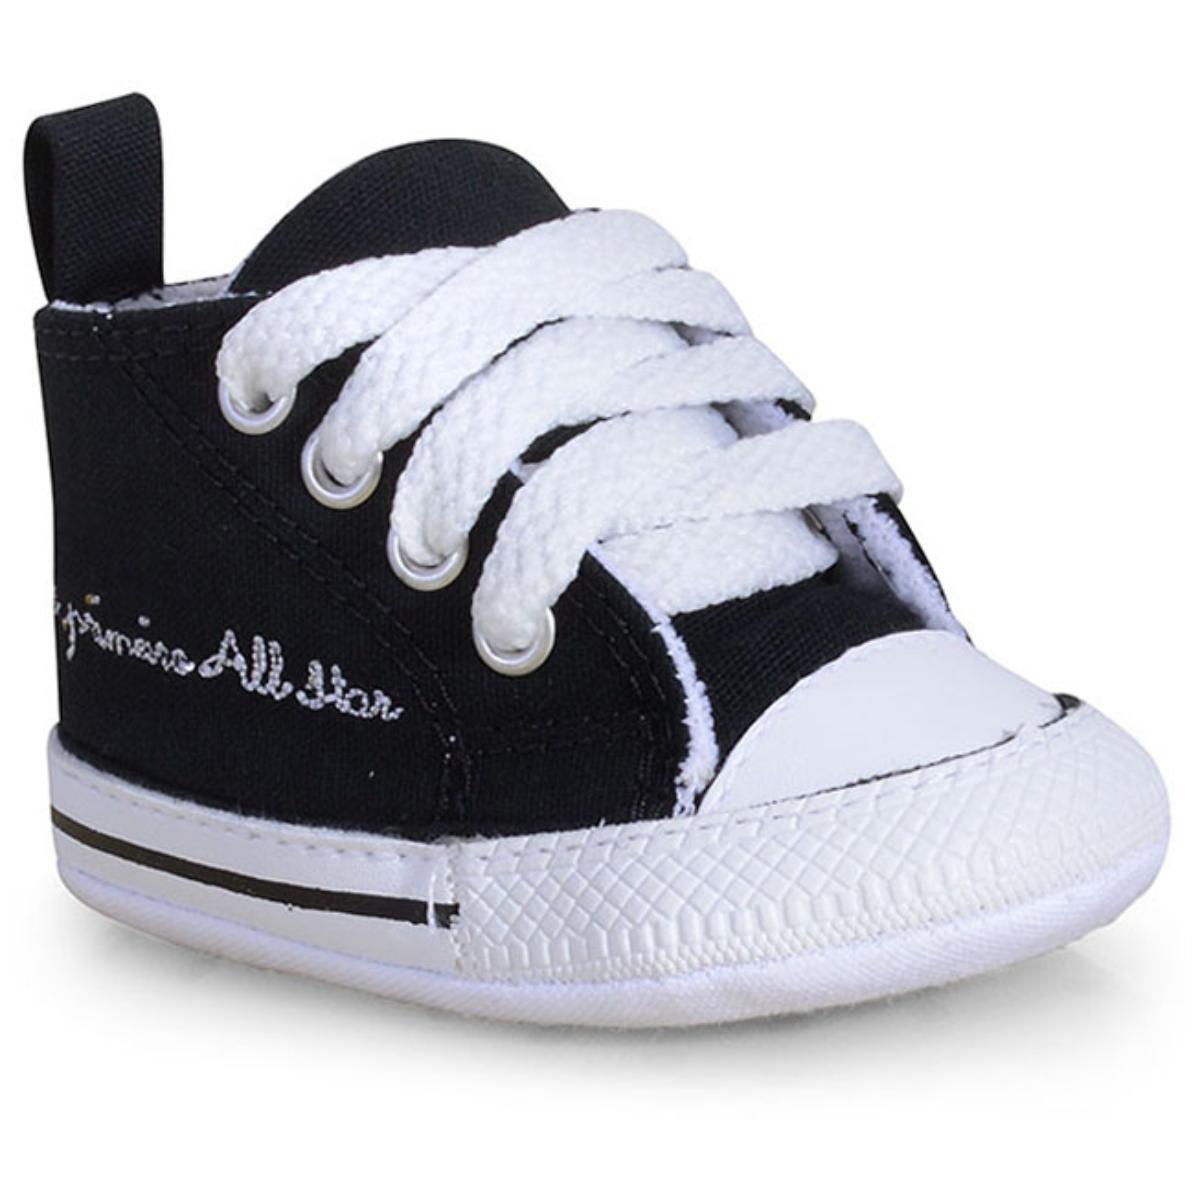 Tênis Uni Infantil All Star Ck04400001 Preto/branco